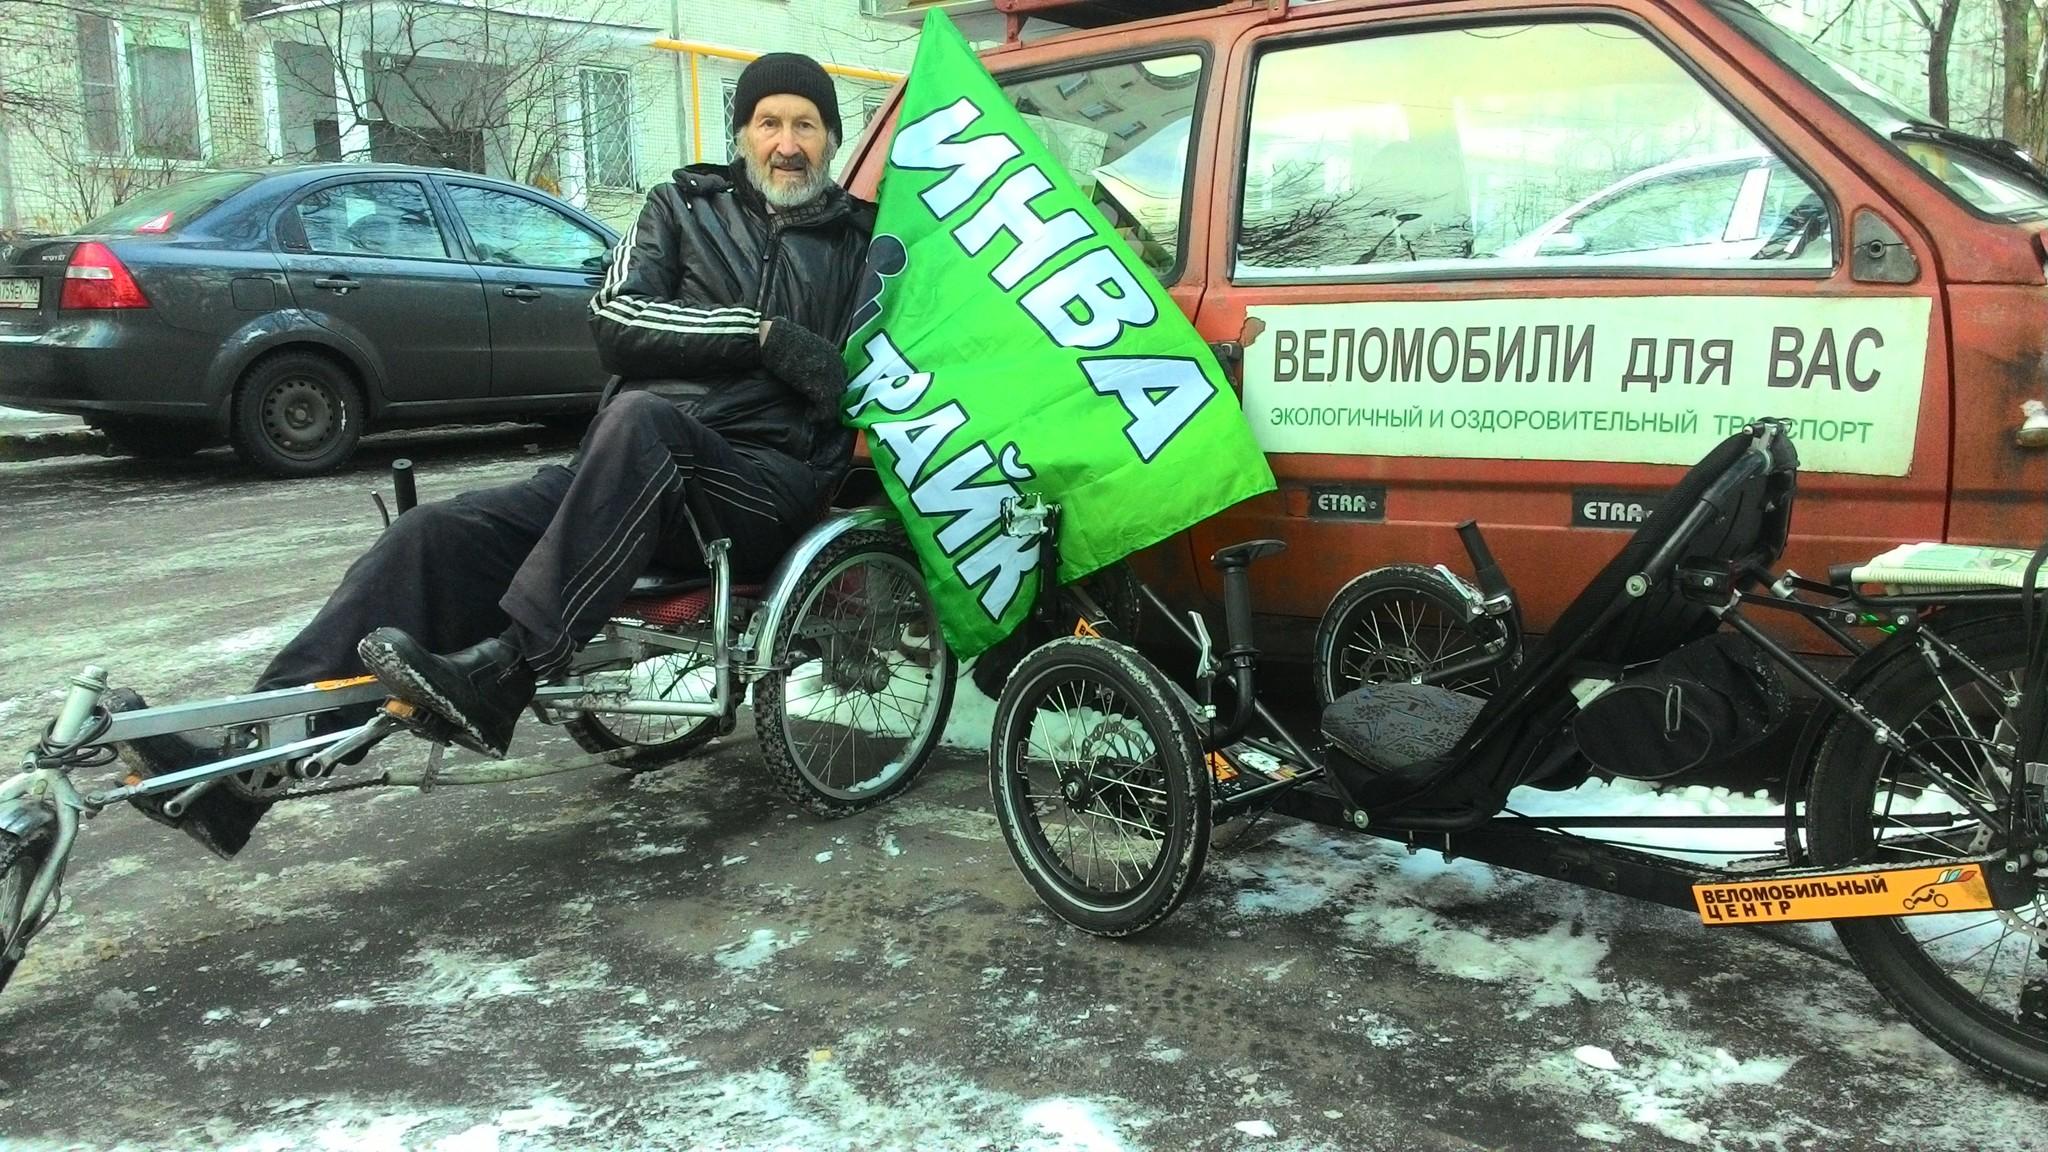 https://content.foto.my.mail.ru/list/maxnev/syzdalchev/h-279.jpg